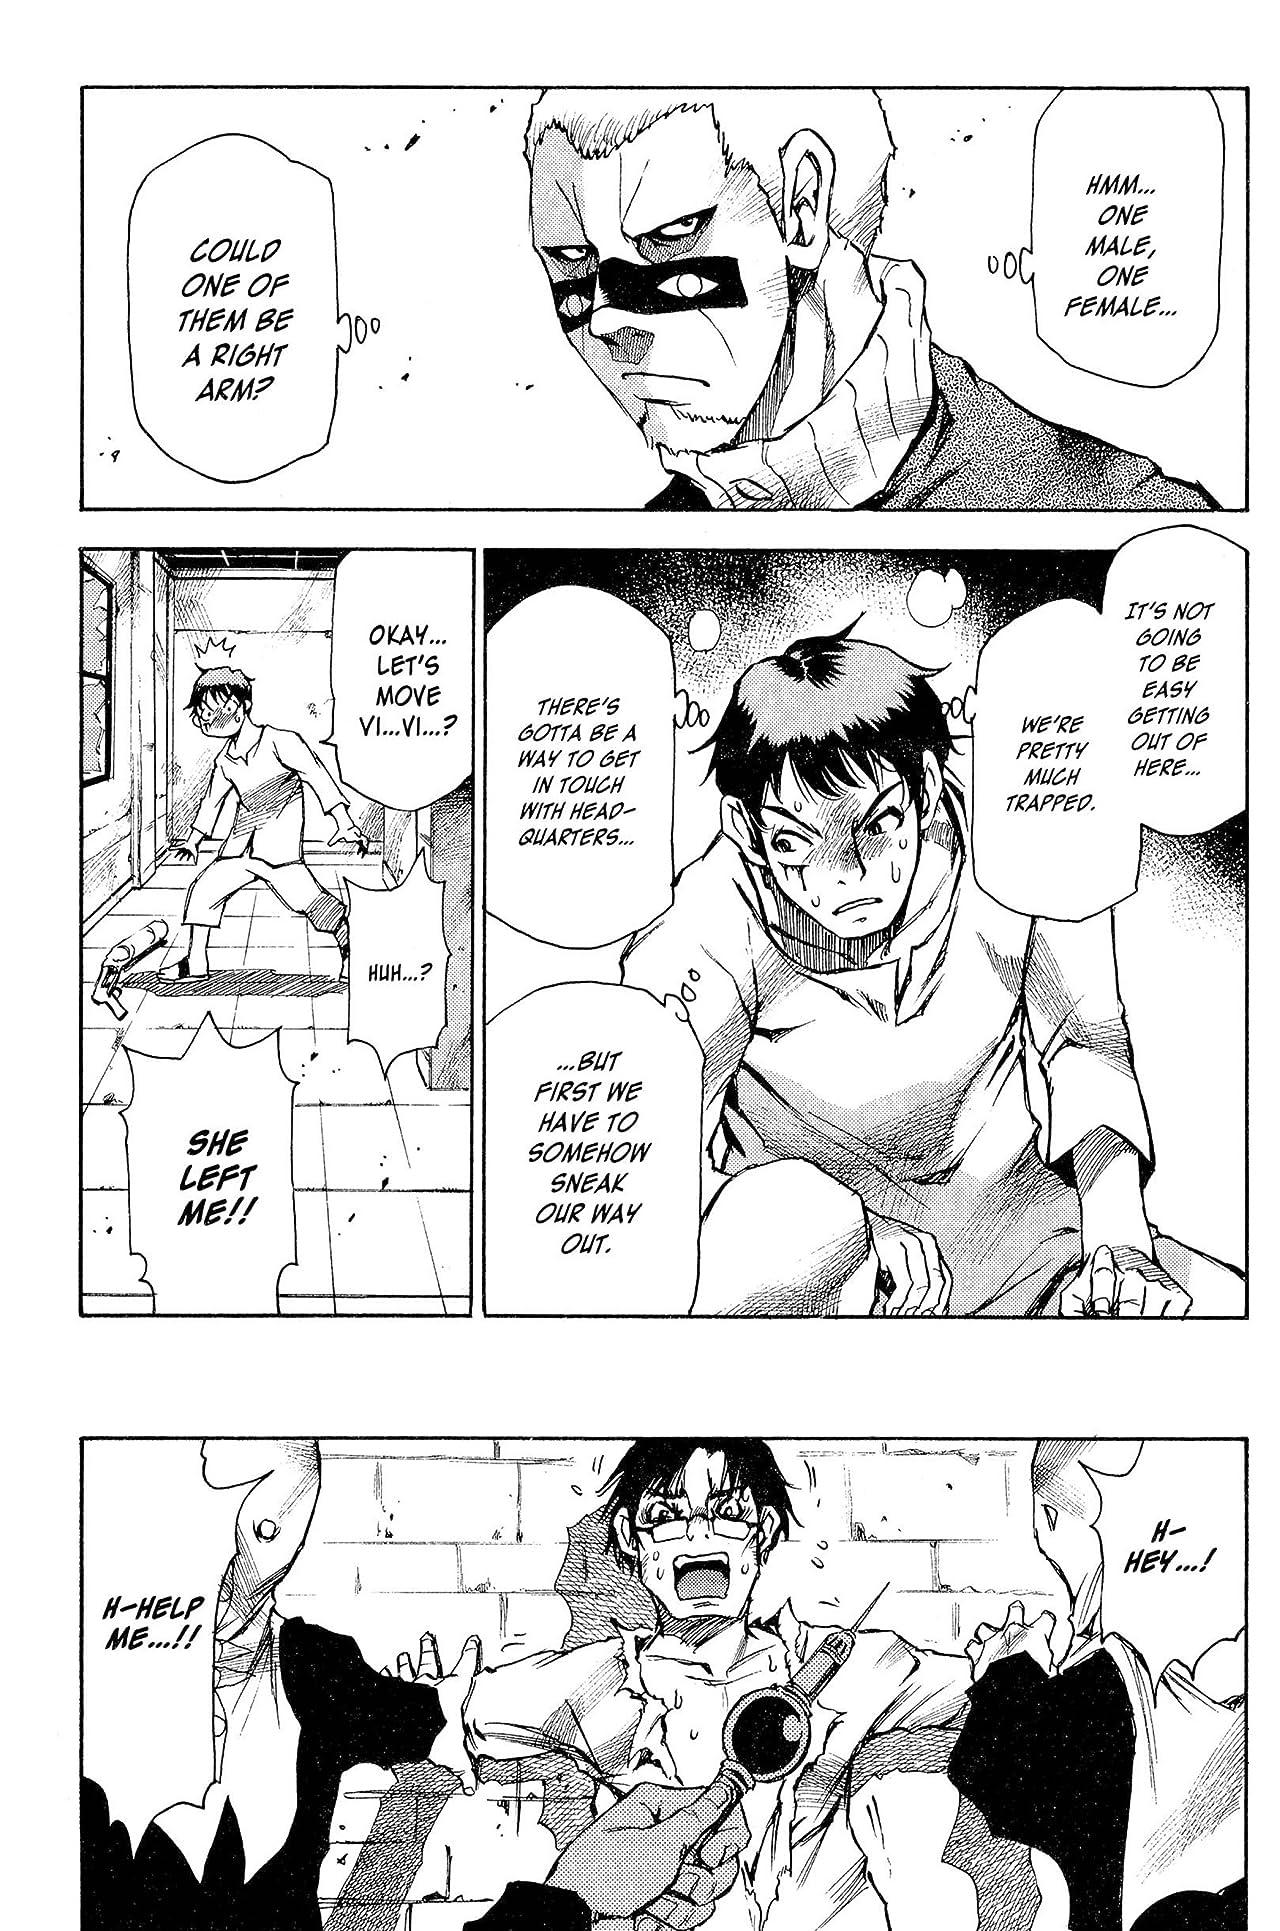 Kamiyadori Vol. 2